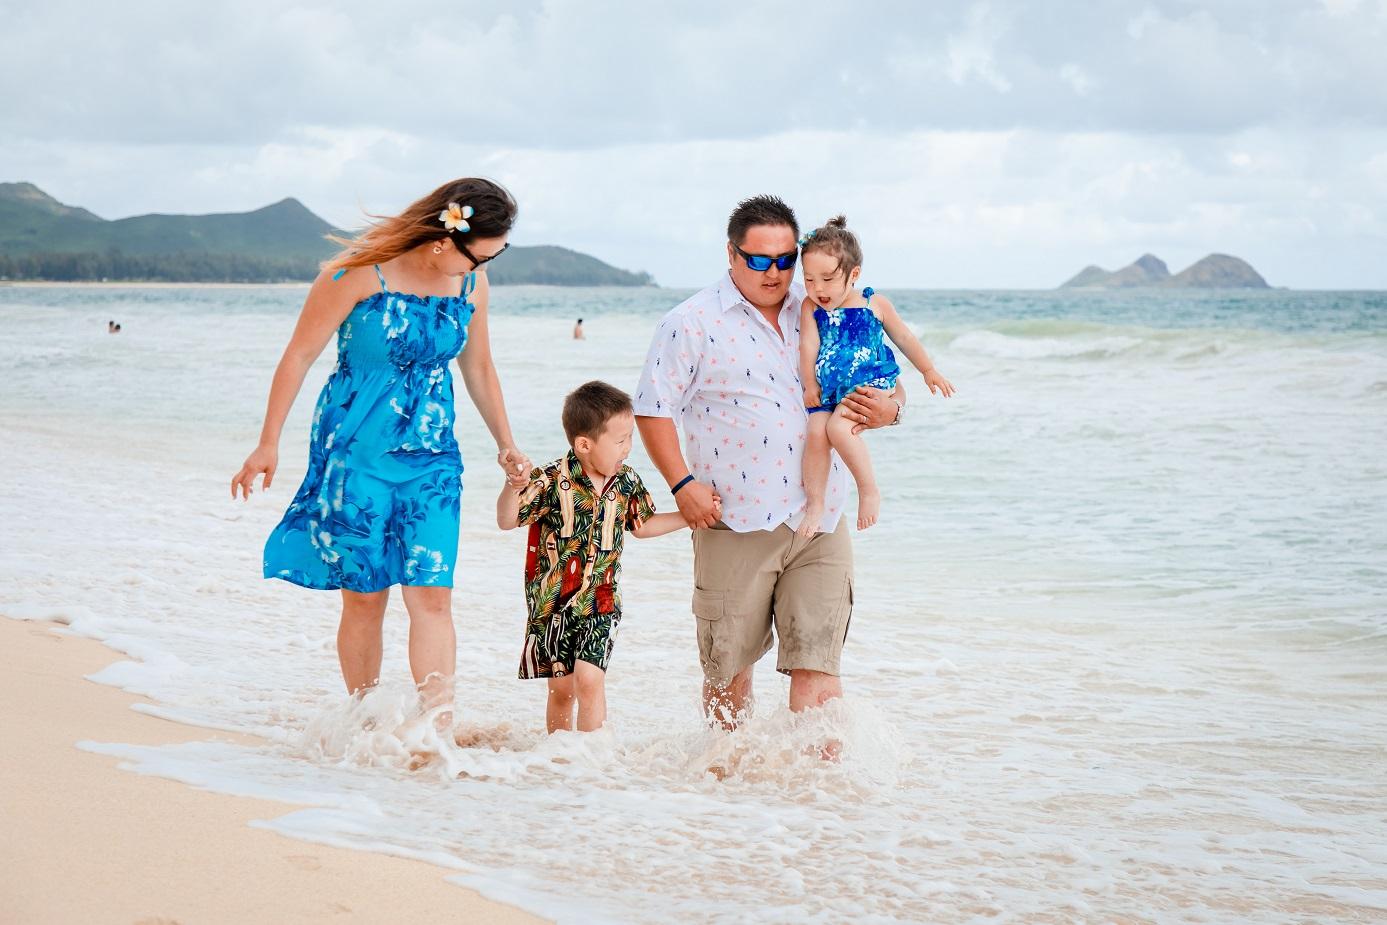 walking in the surf family photo shoot oahu hawaii